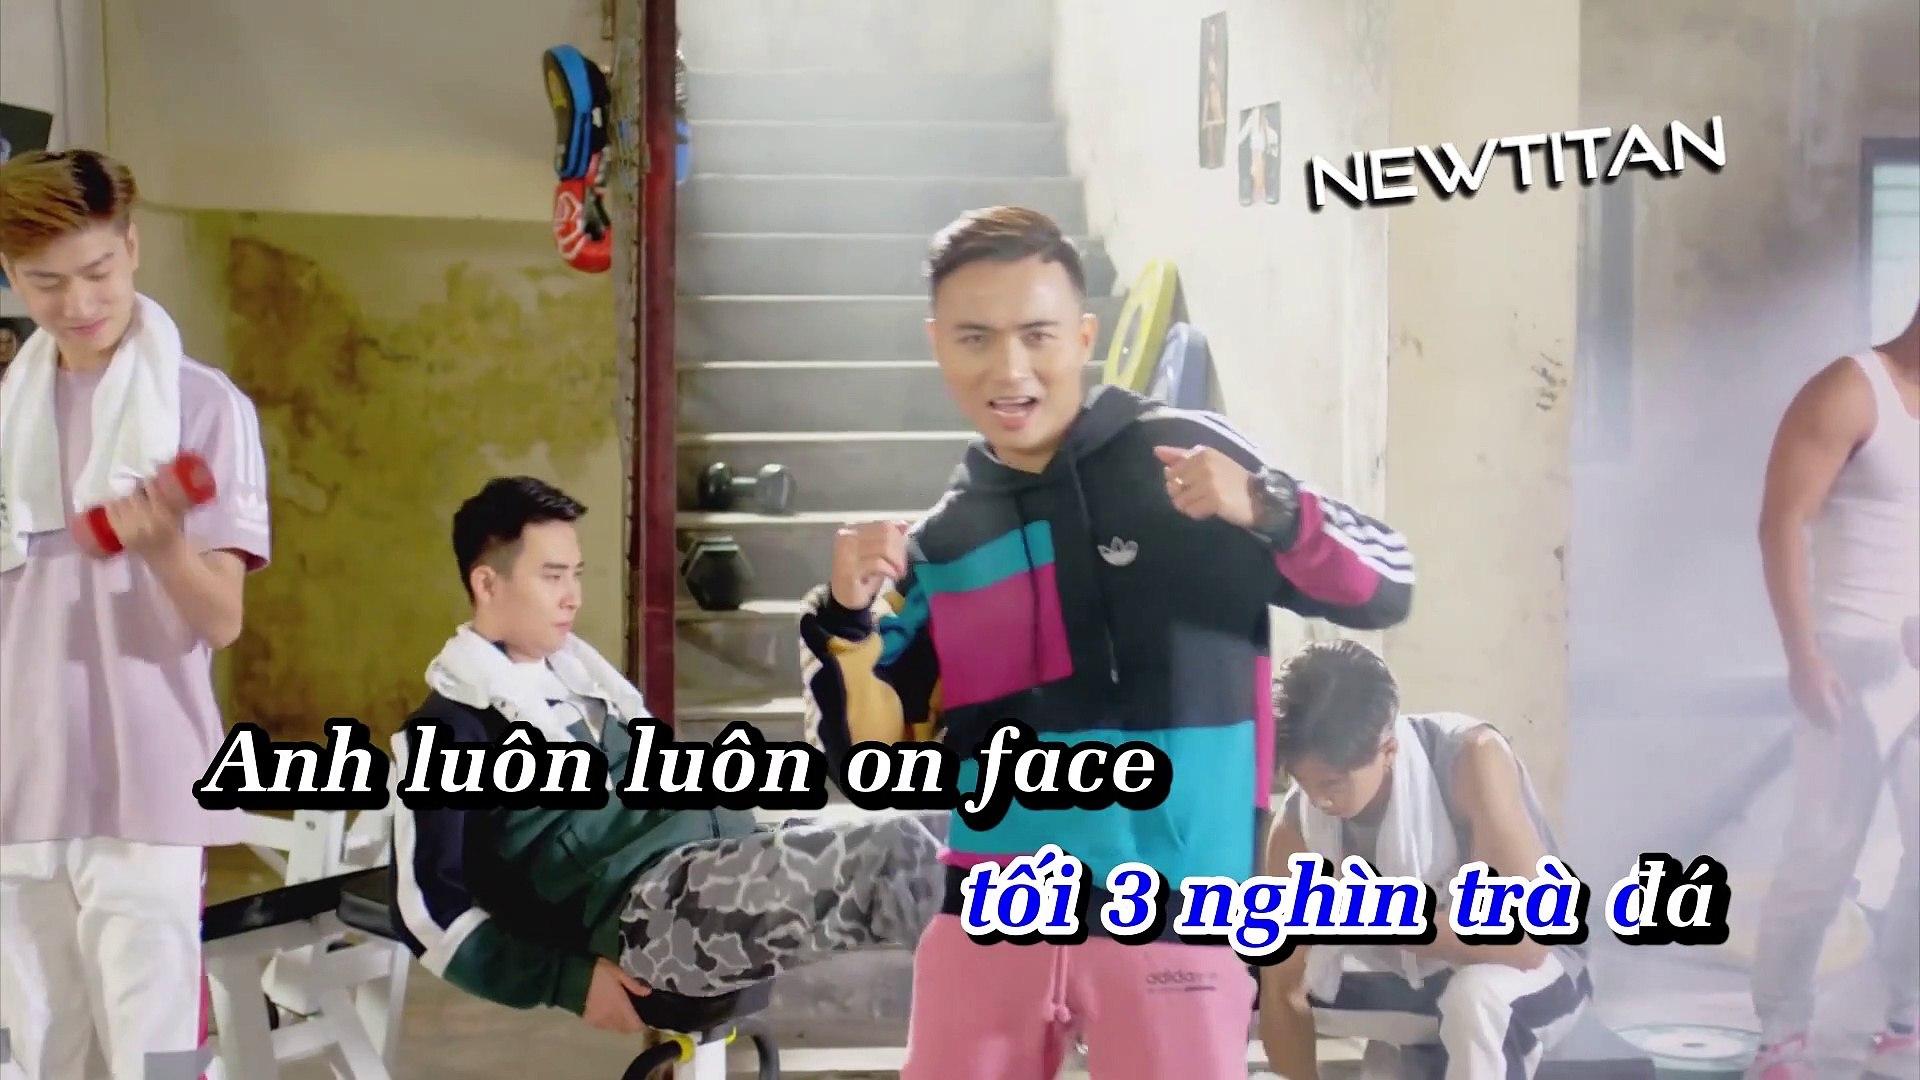 [Karaoke] Anh Thanh Niên - HuyR [Beat Gốc]